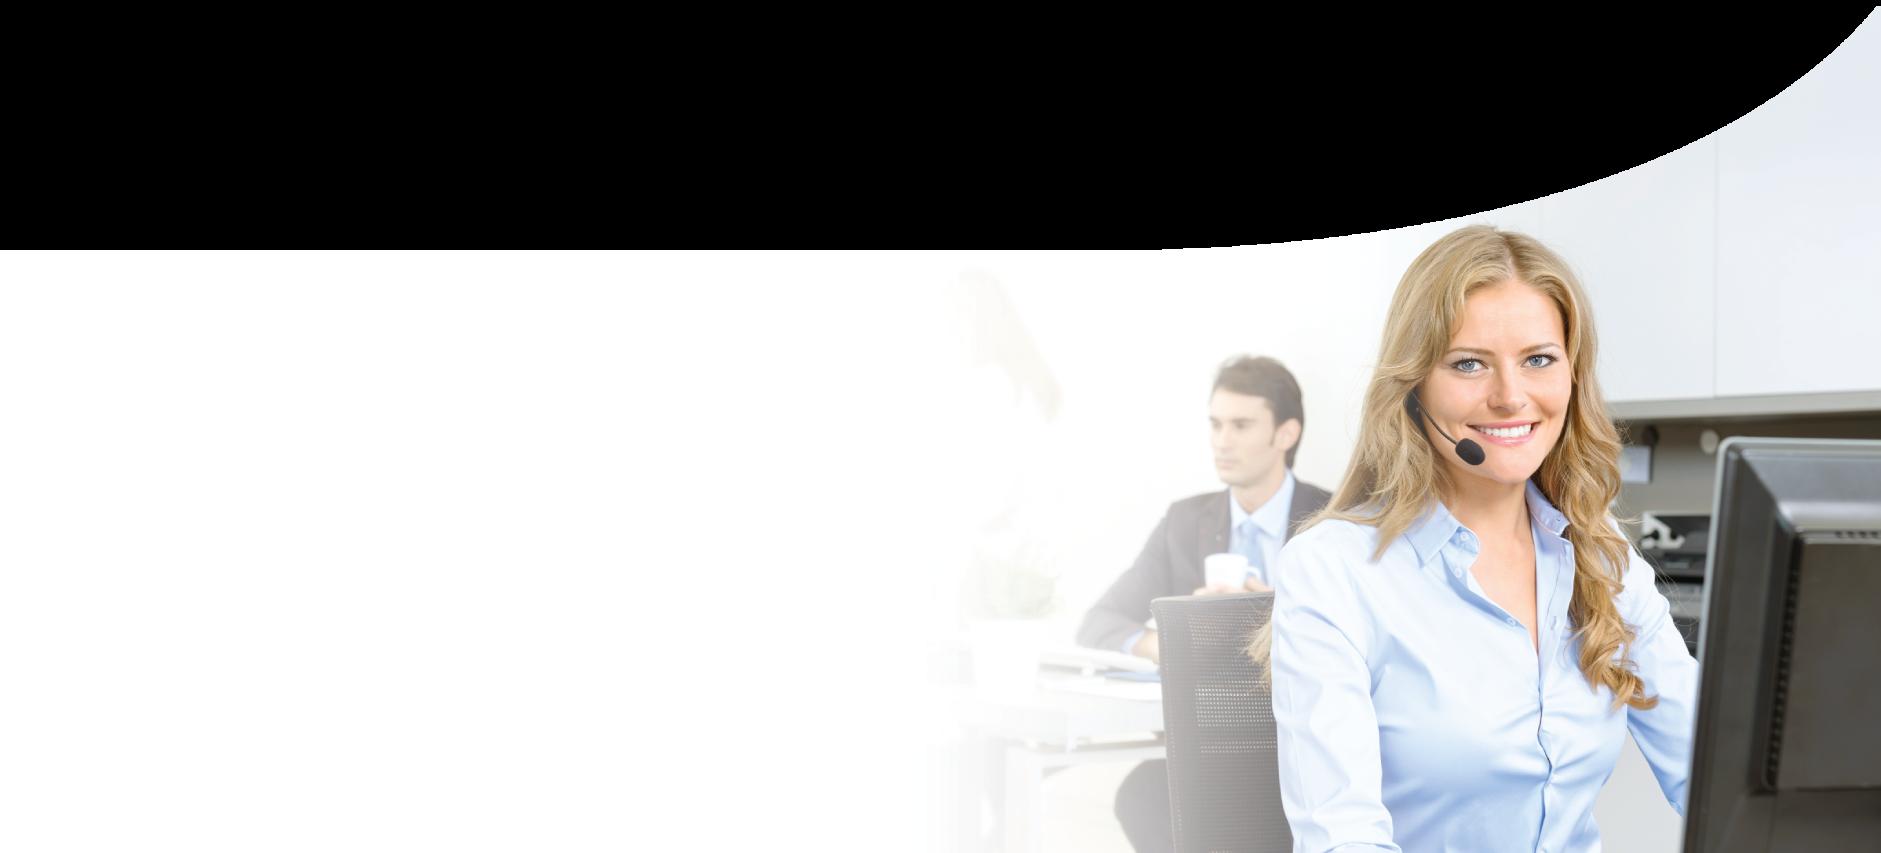 Accounts receivable financing representative at Commercial Funding